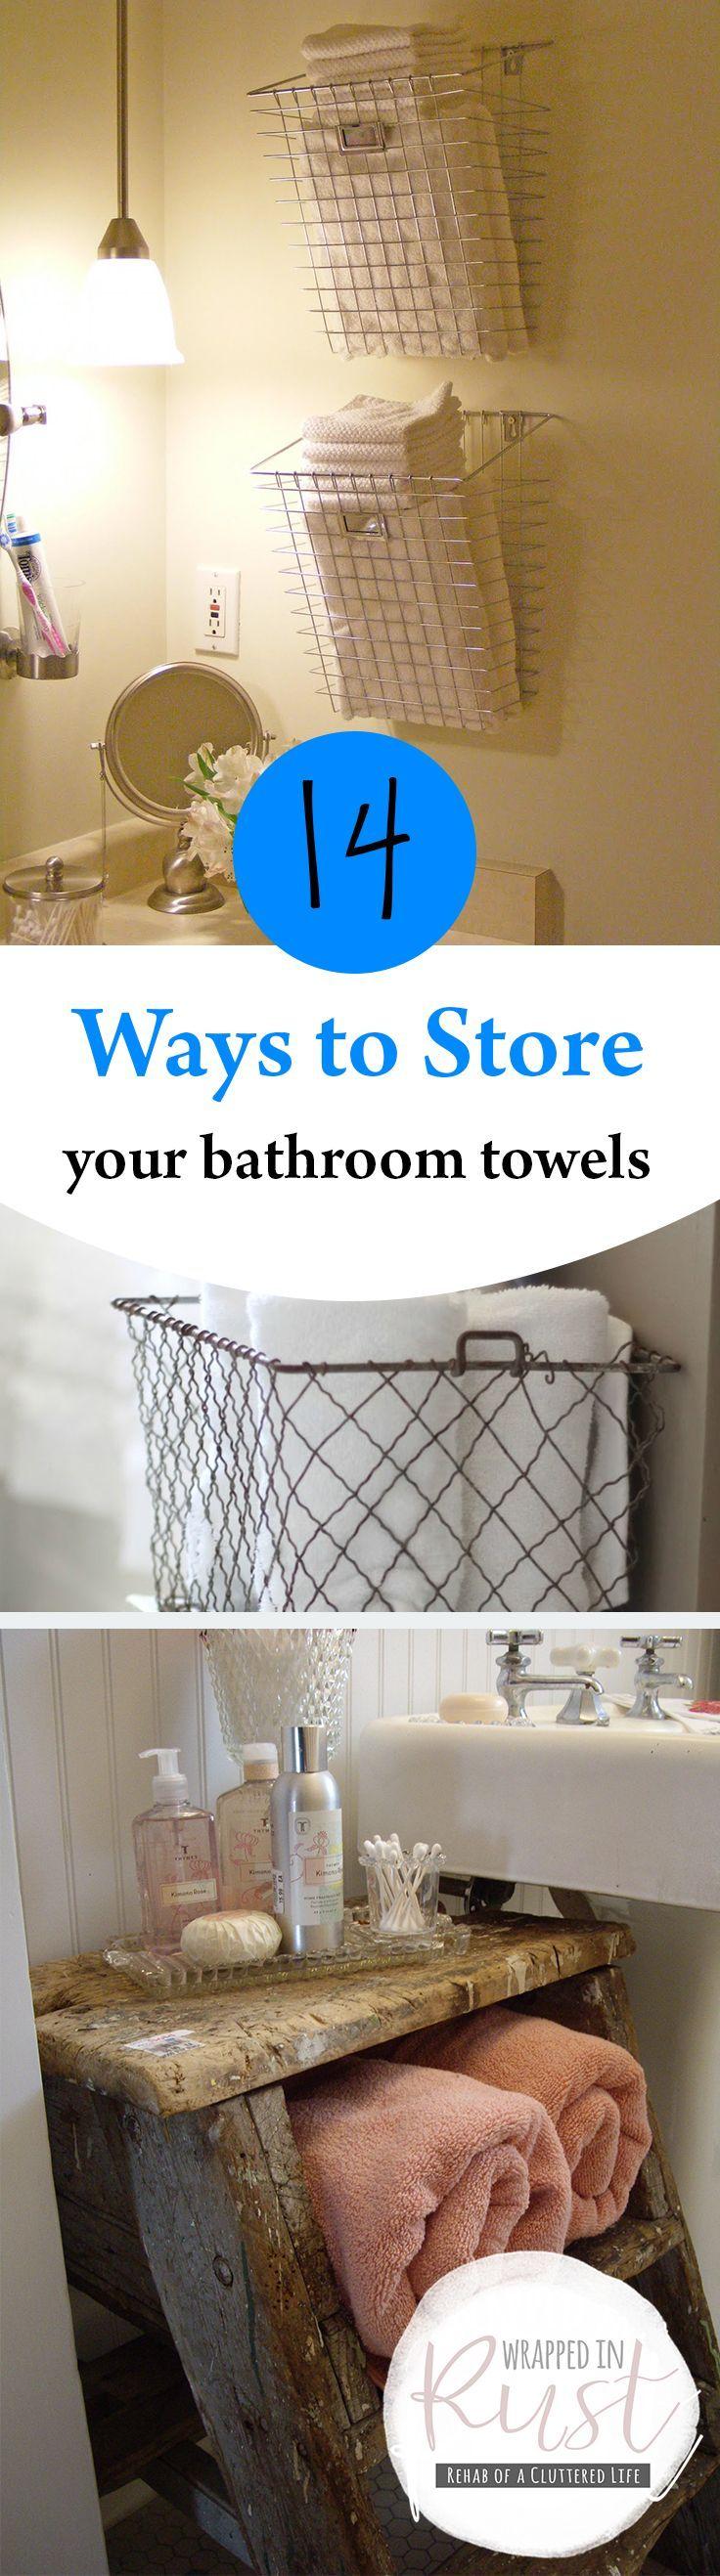 Best 25 Decorative bathroom towels ideas only on Pinterest